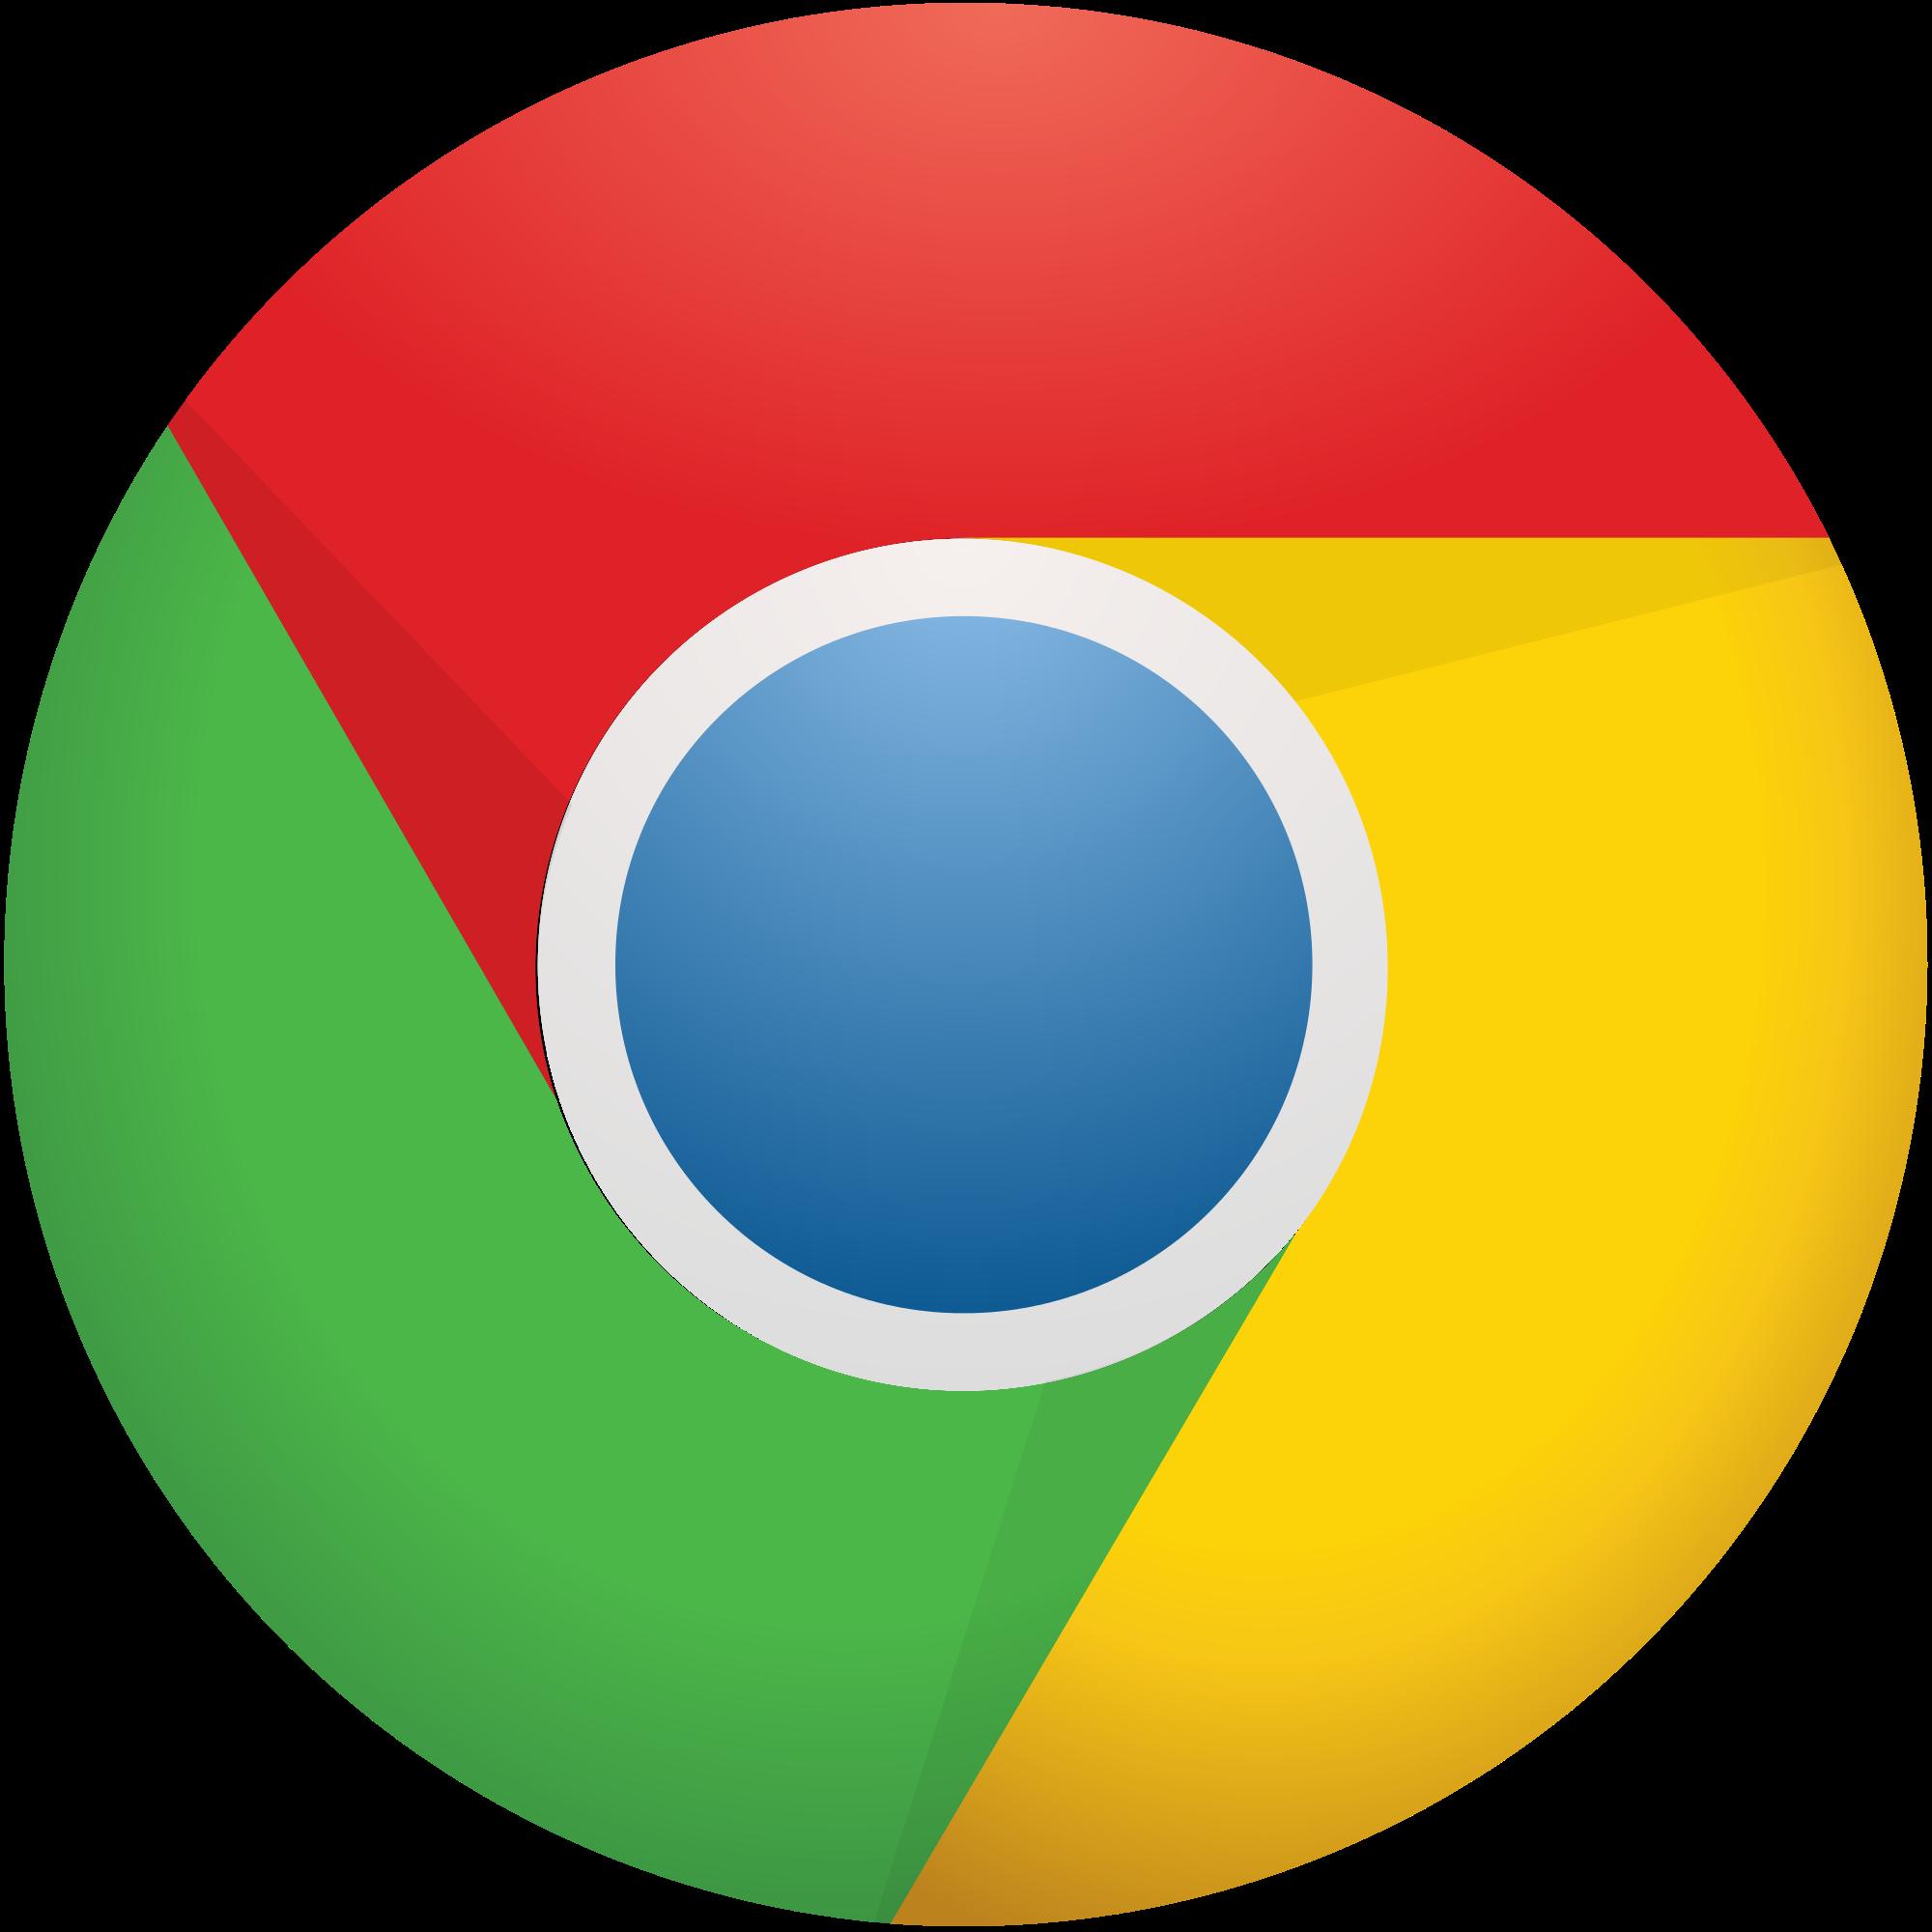 Google Chrome Clipart Transparent.